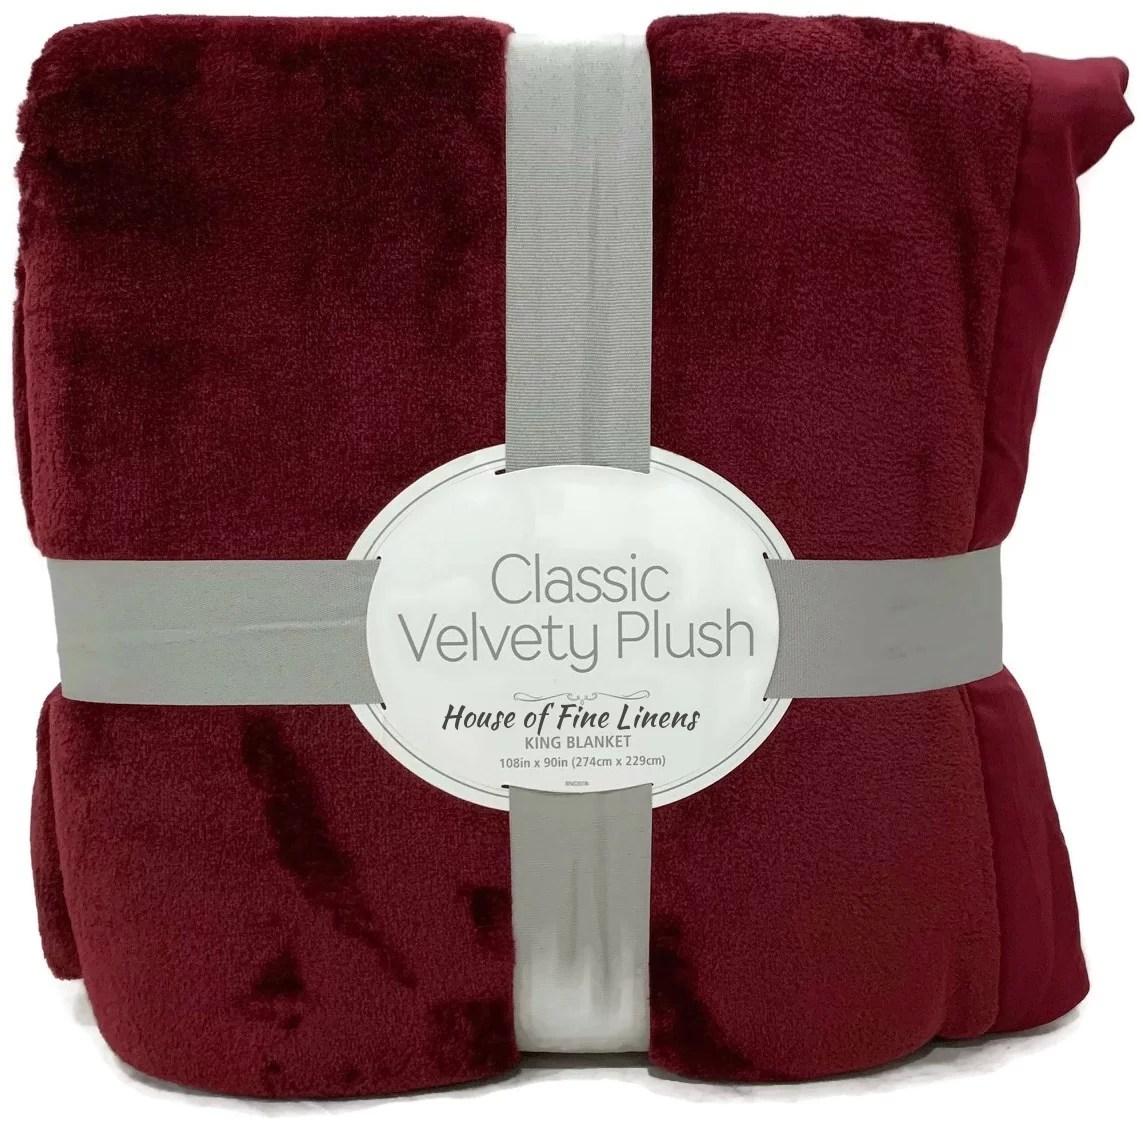 berkshire bedding classic velvety plush